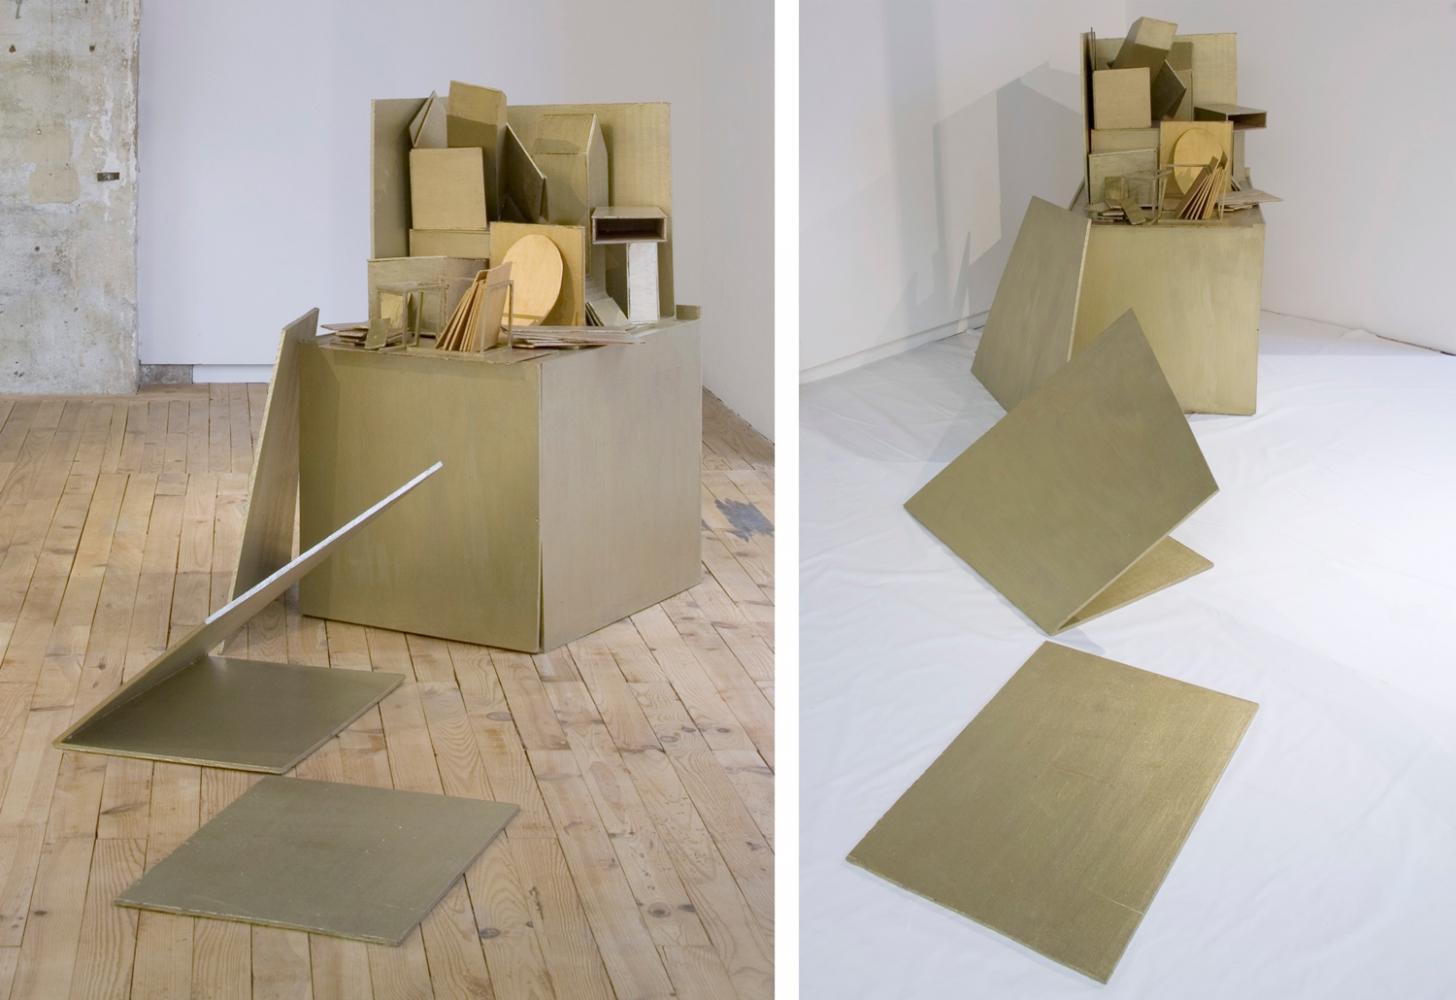 constructions-texte-image-07